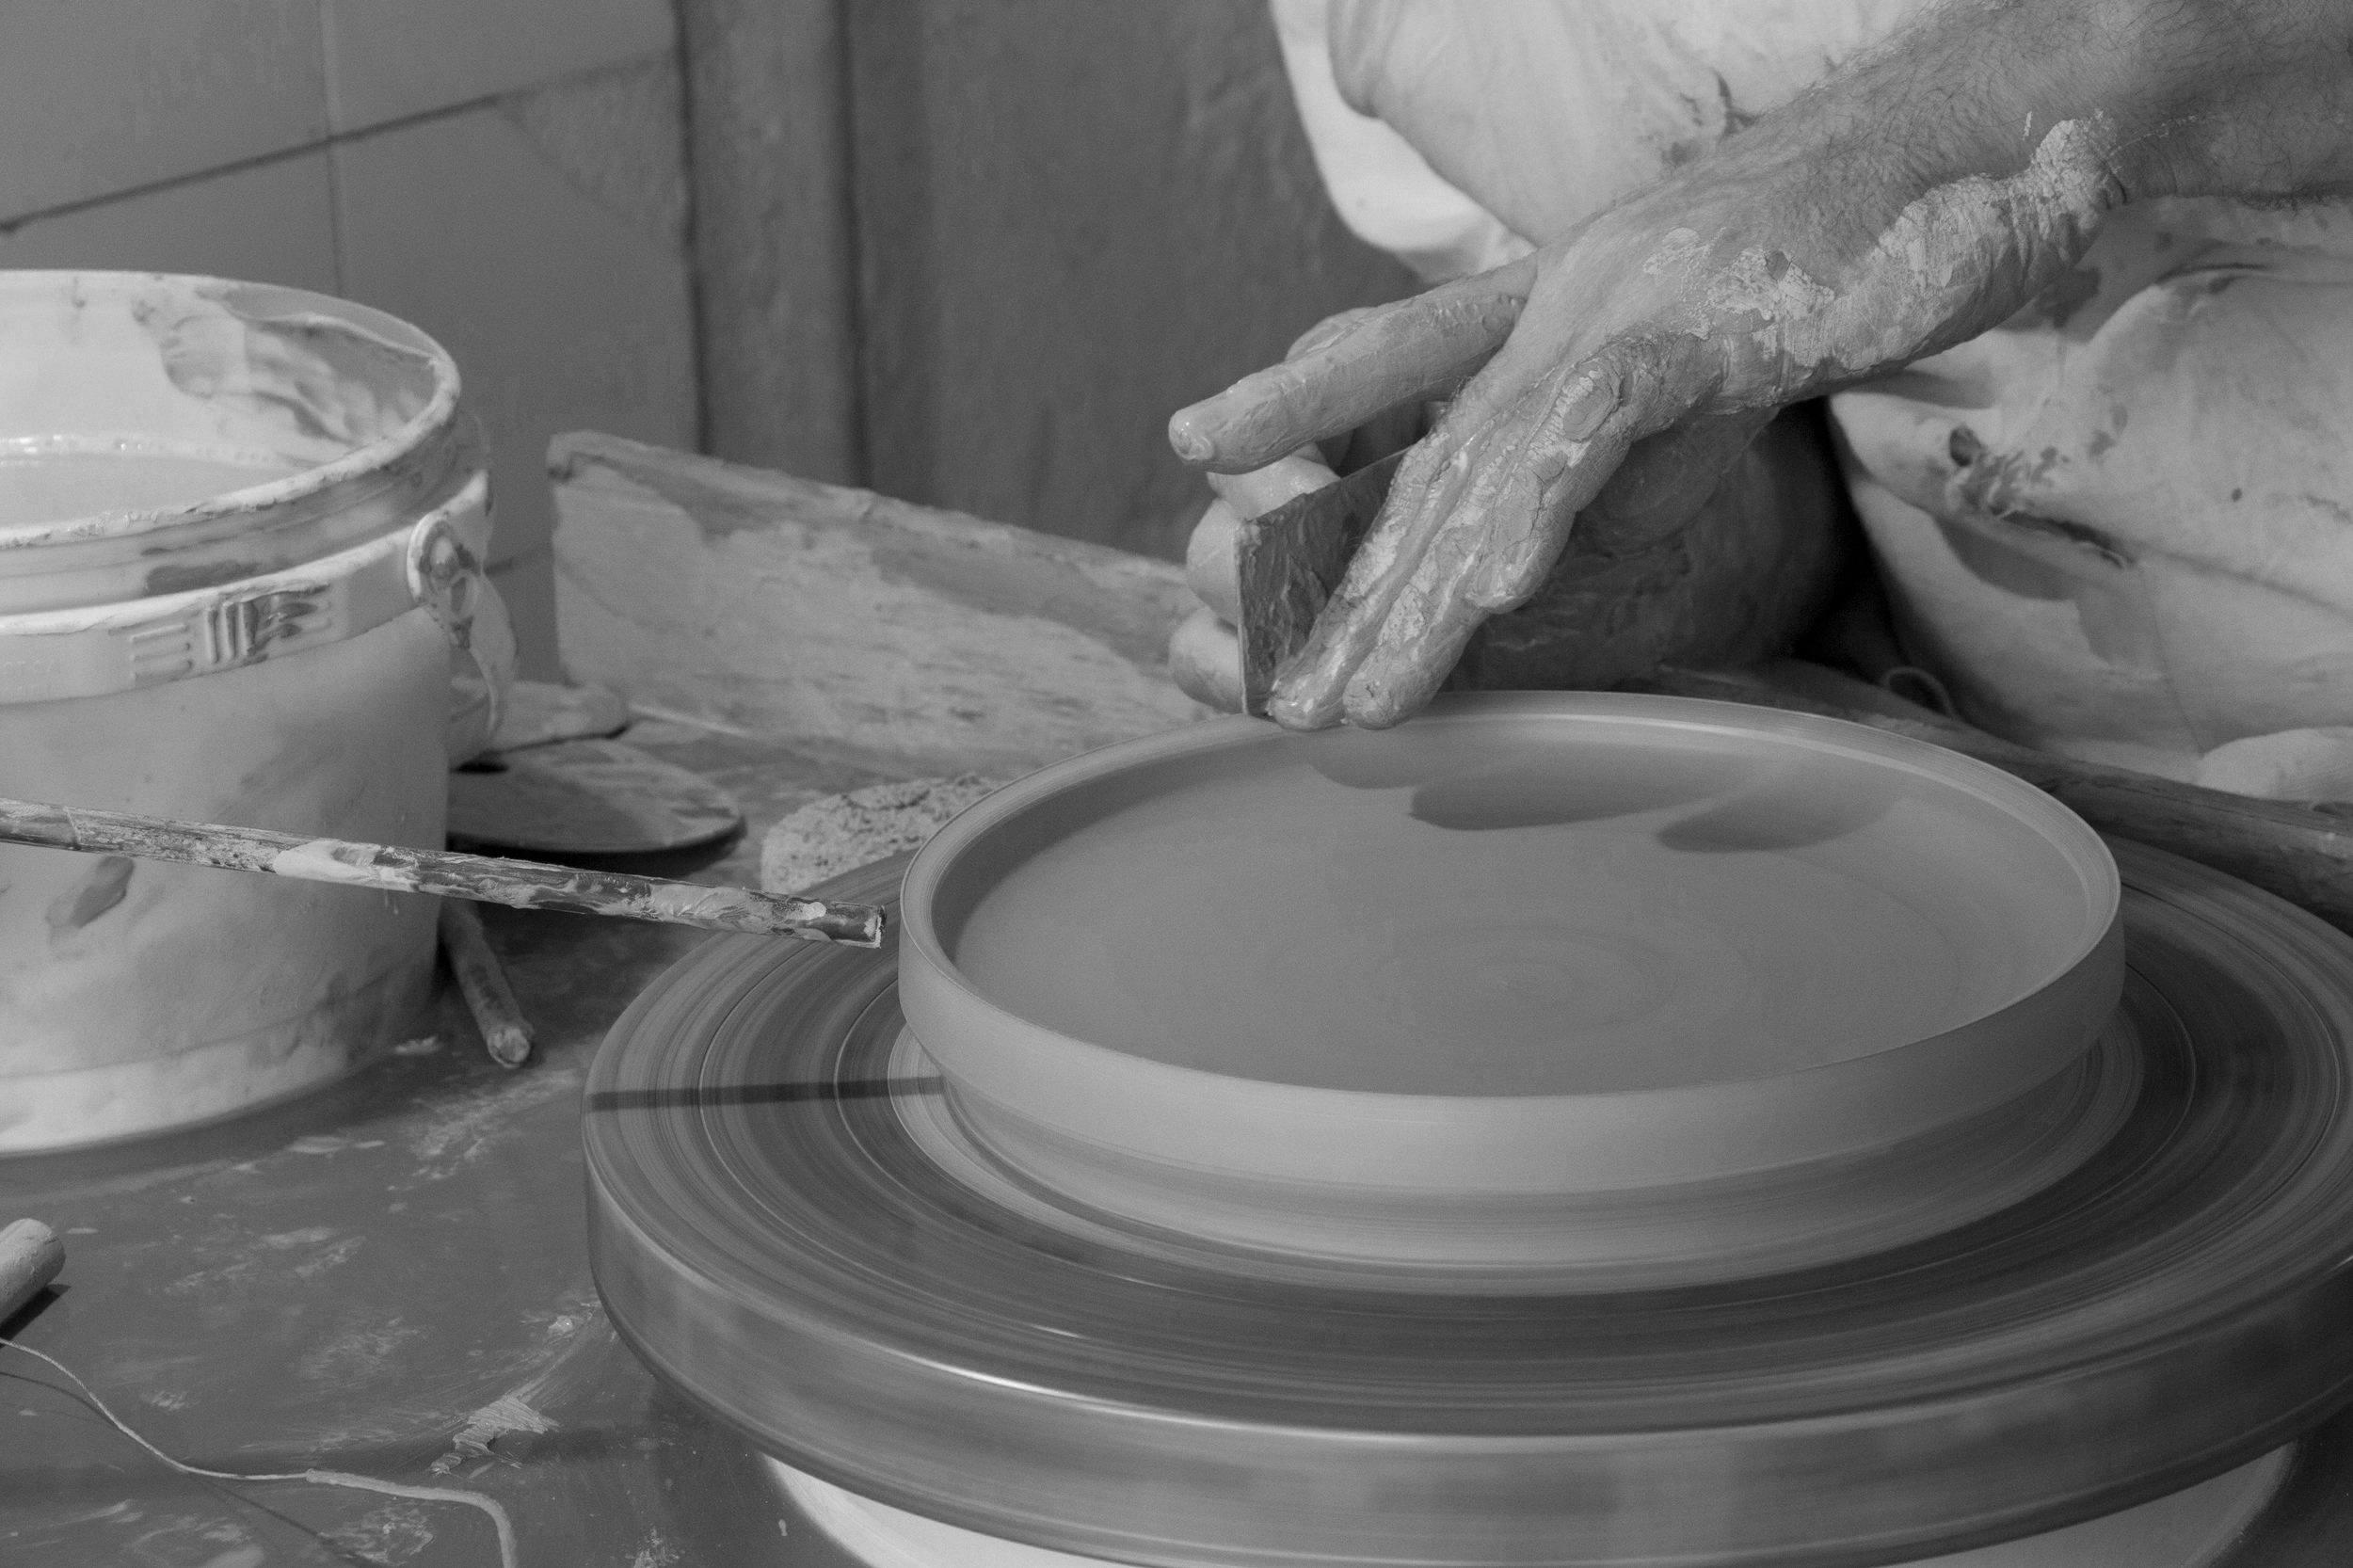 munoz-josefina-design-paysages-desertiques-ceramics-tray-tableware-9.jpg